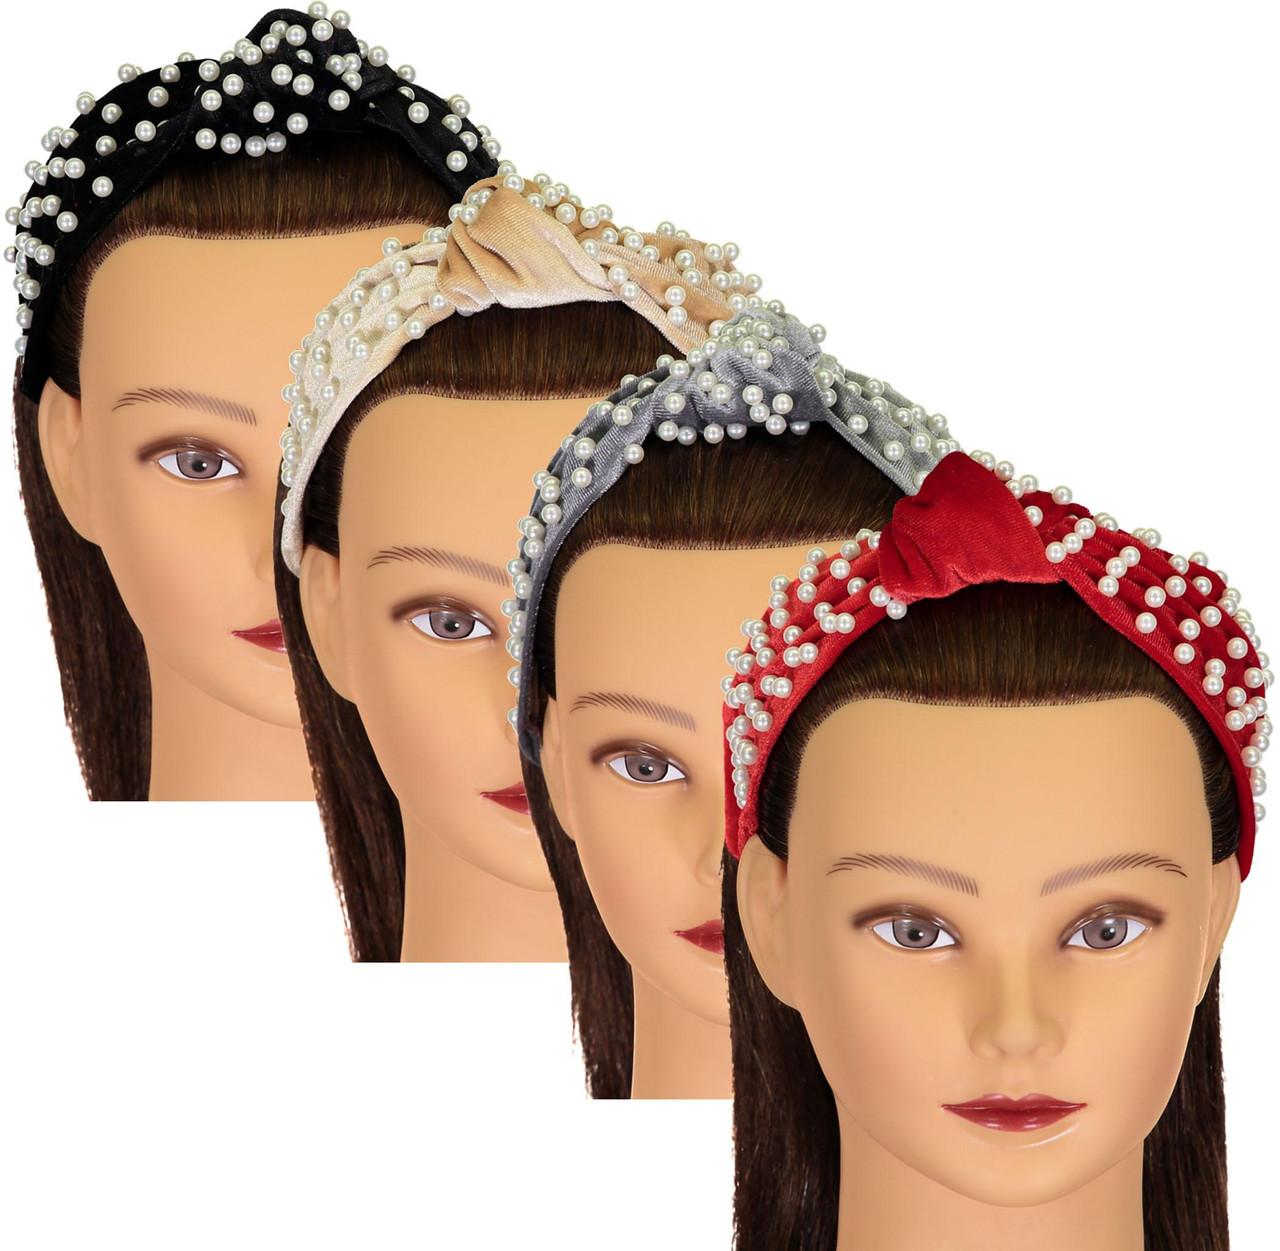 Riqki Girls Velvet Pearl Turban Knot Headband - HB1916